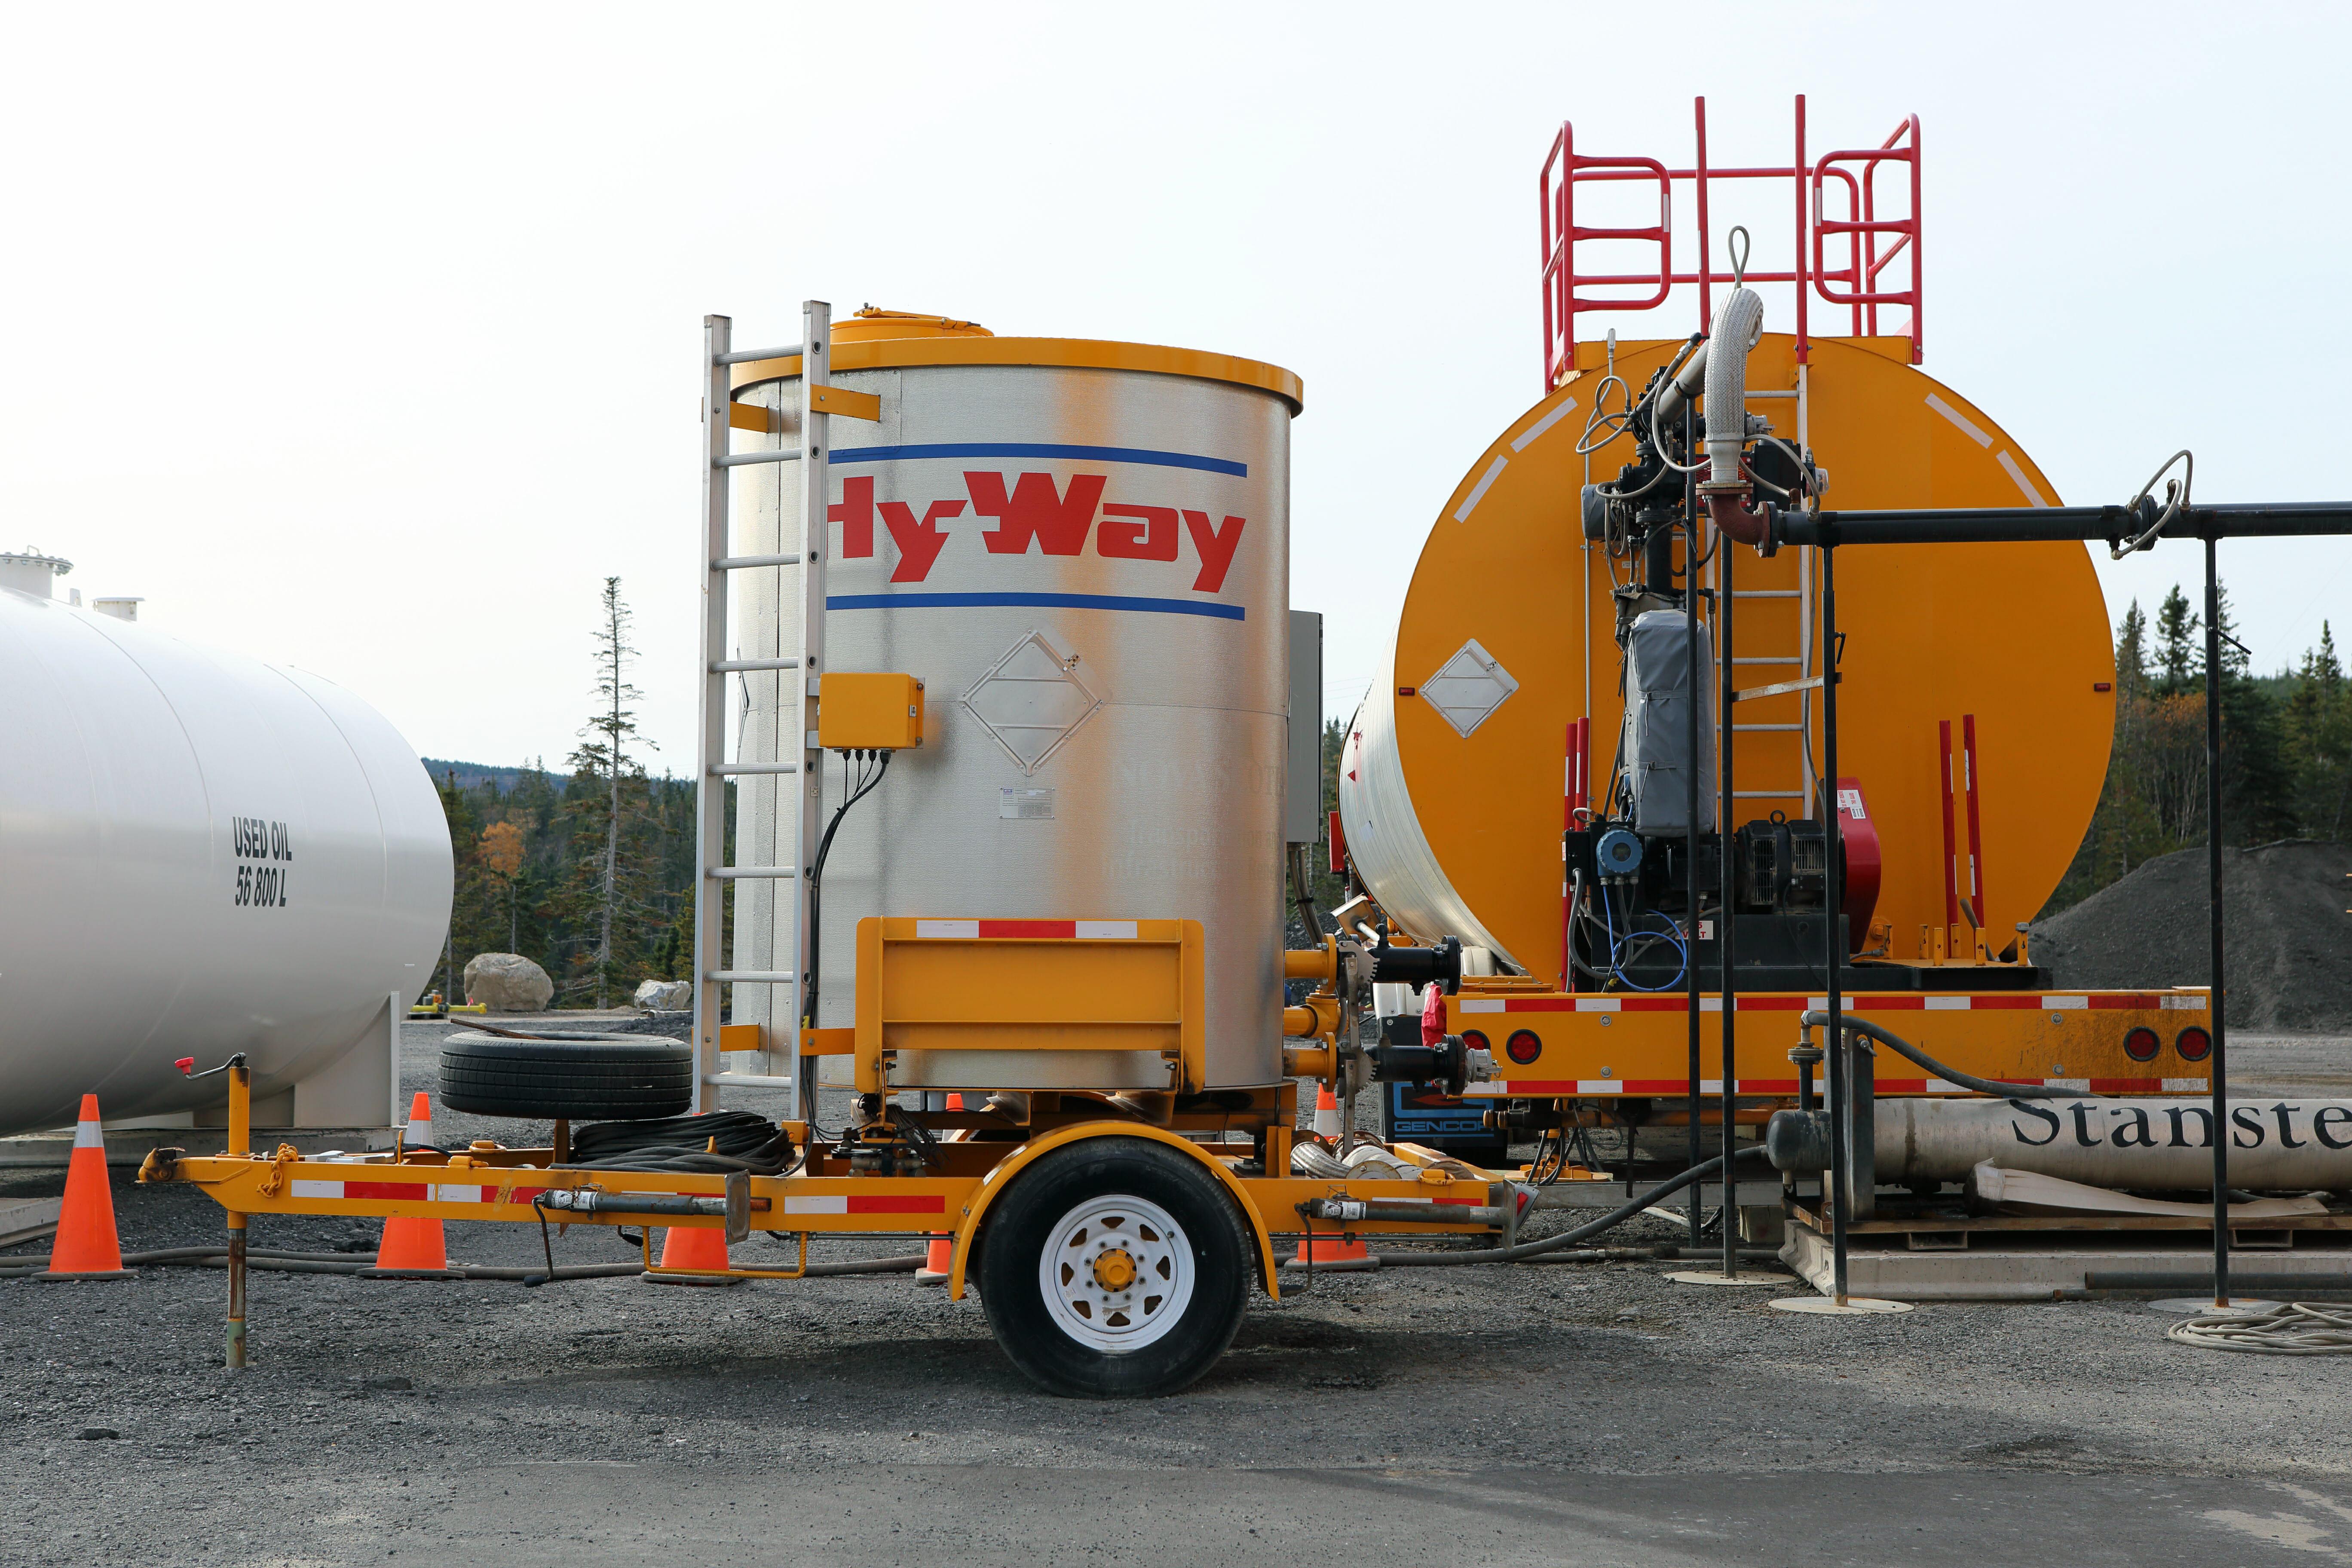 Hy-Way Asphalt Storage Tanks | Construction Equipment